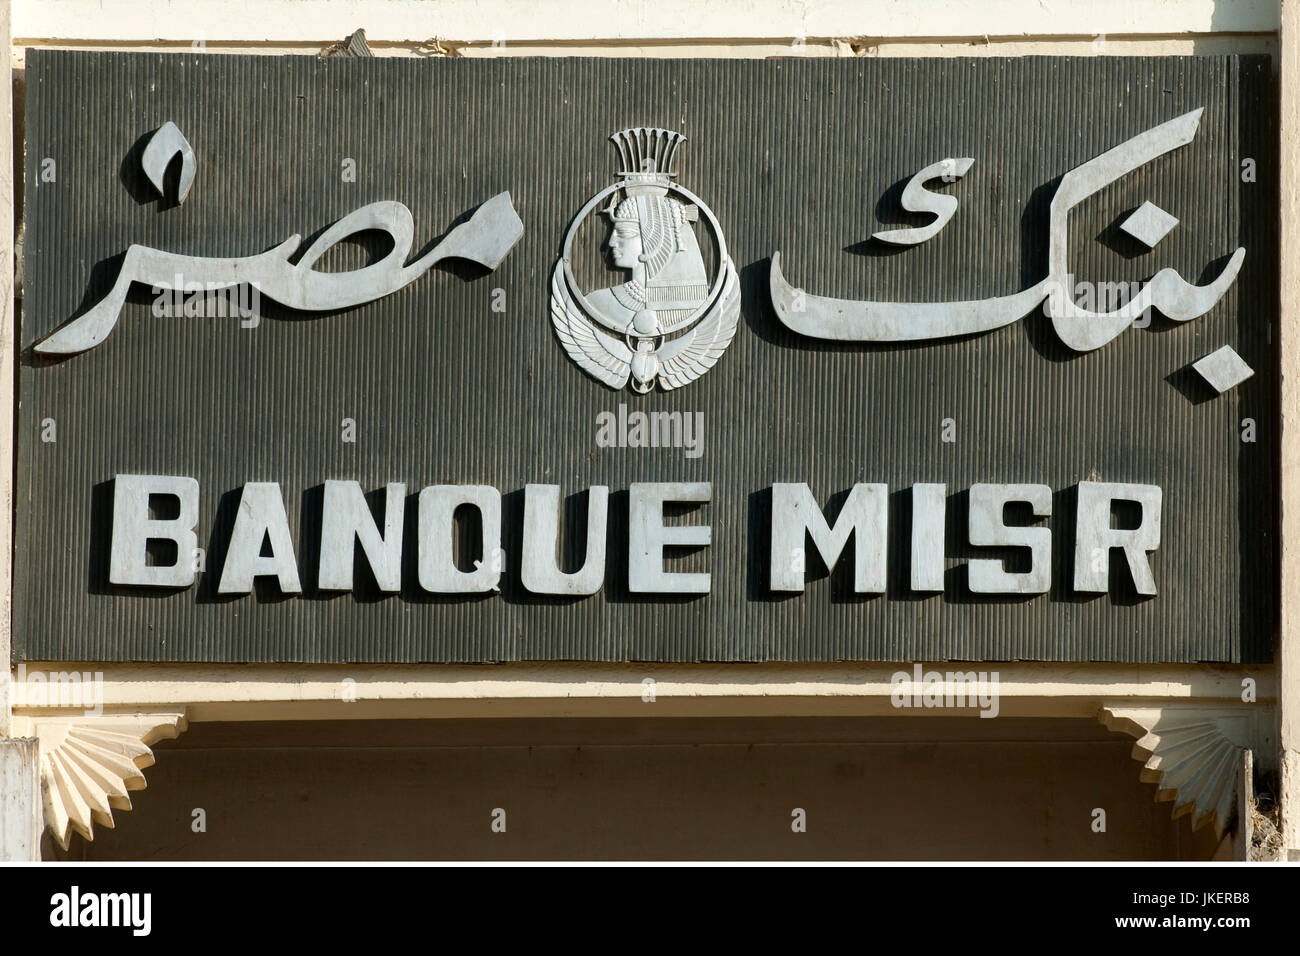 Aegypten, Assuan, Bank Misr - Stock Image